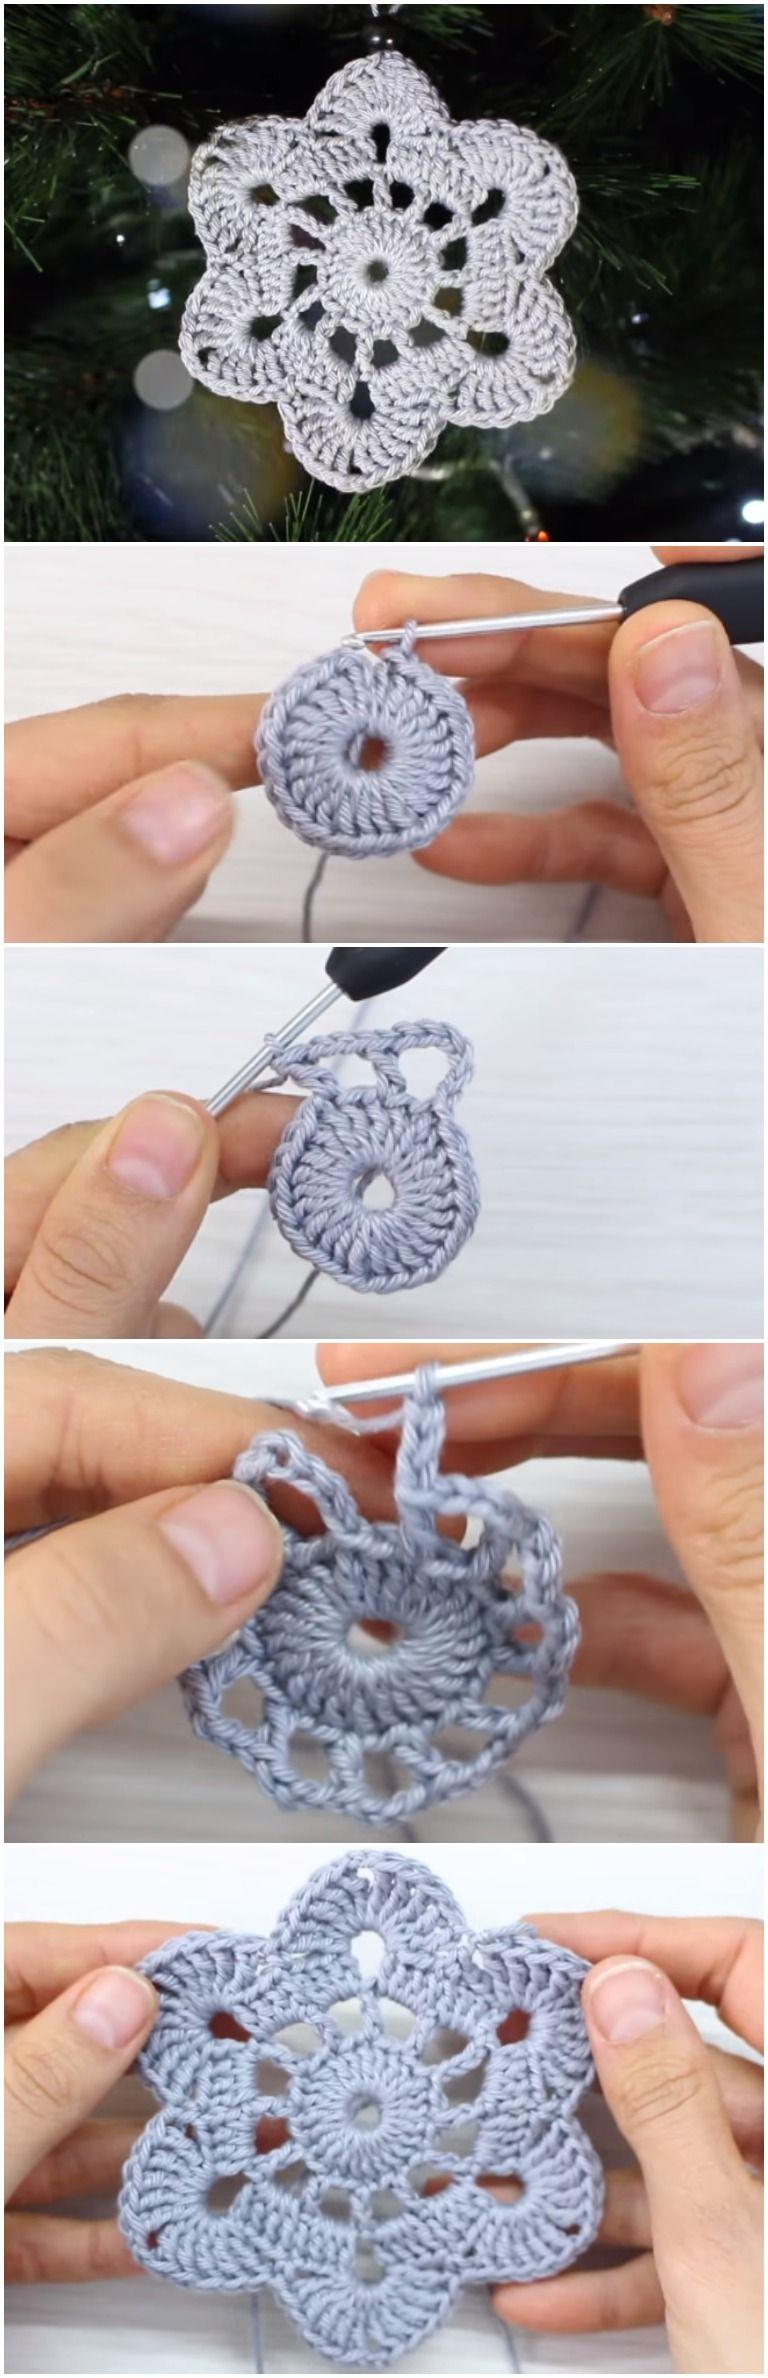 Crochet Snowflake Christmas Ornament